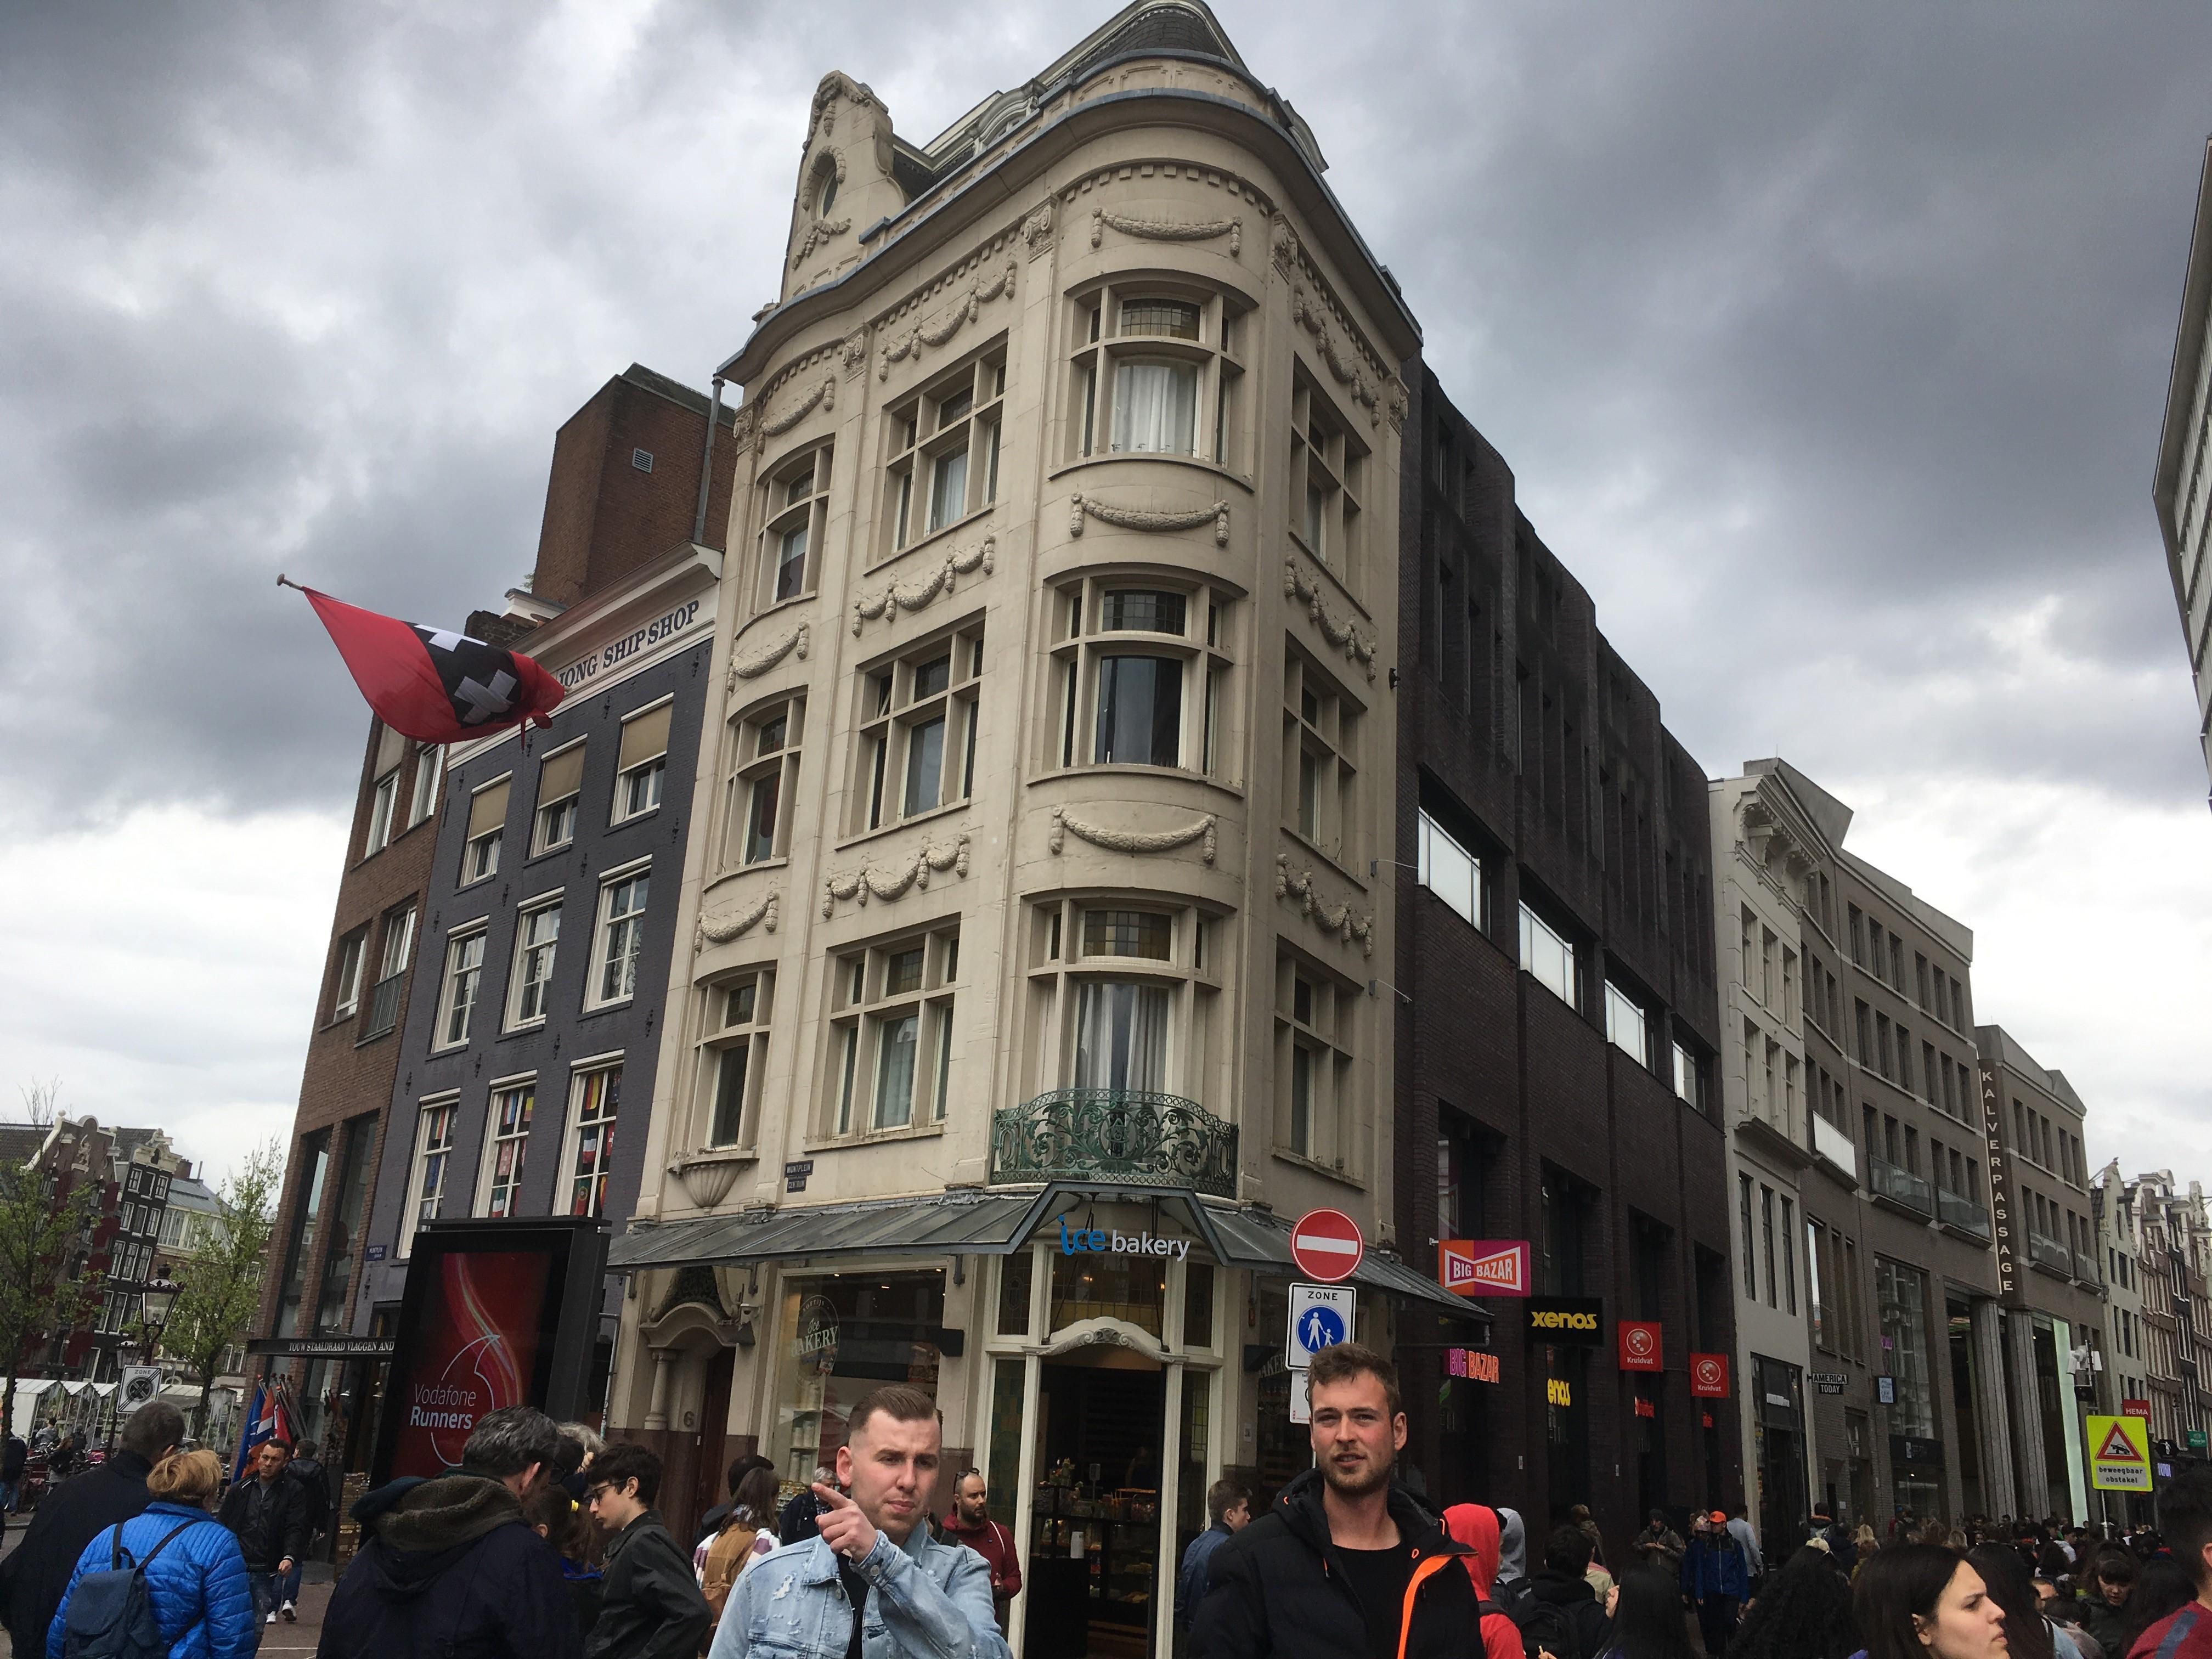 Amsterdam – Kalverstraat 236